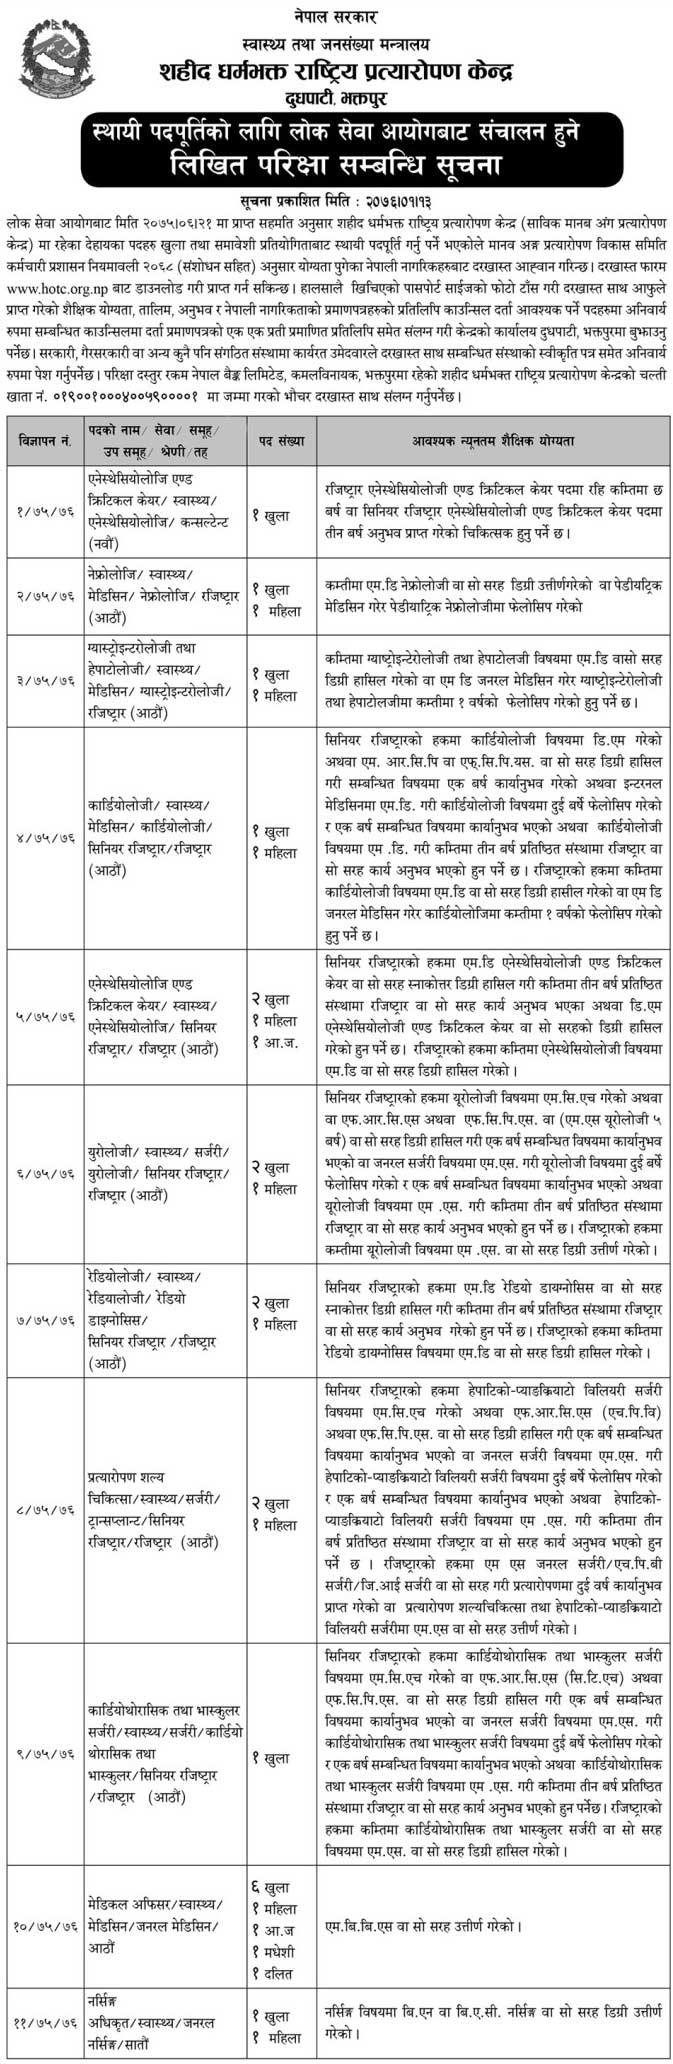 Shahid Dharma Bhakta National Transplant Center Vacancy